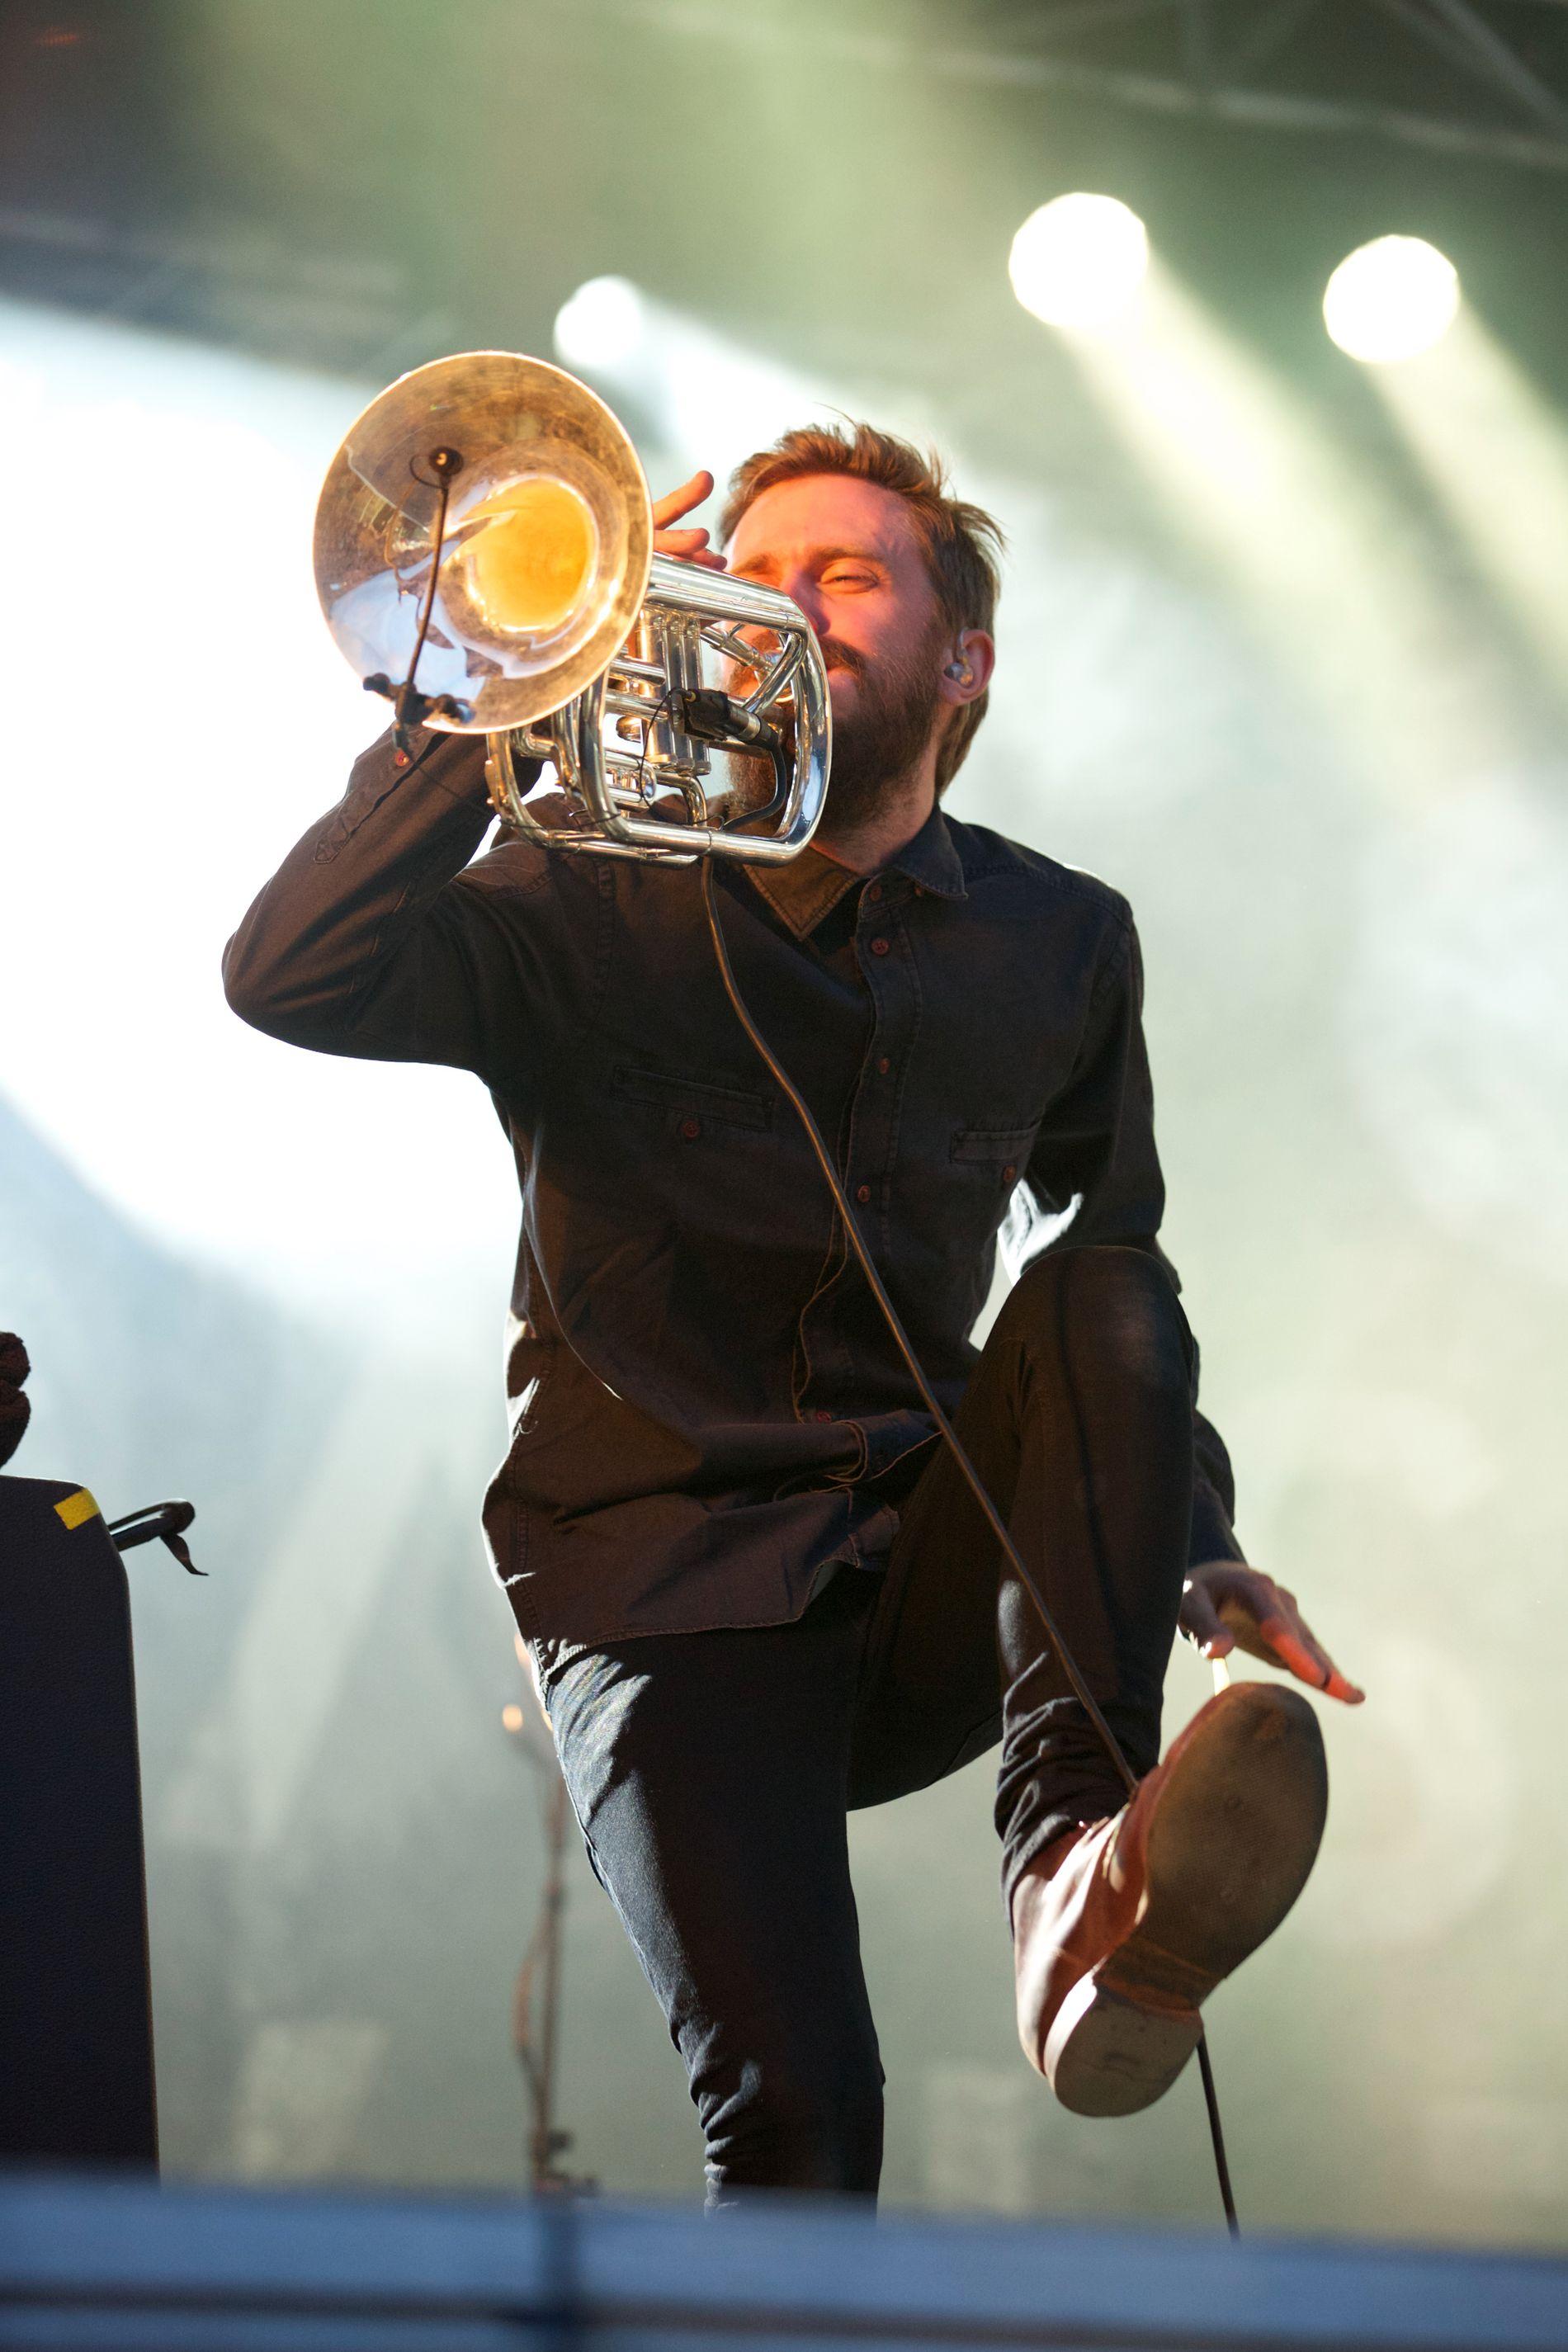 BLÅSER I DET: Kristoffer Lo på scenen med Highasakite i 2014. Foto: GETTY IMAGES